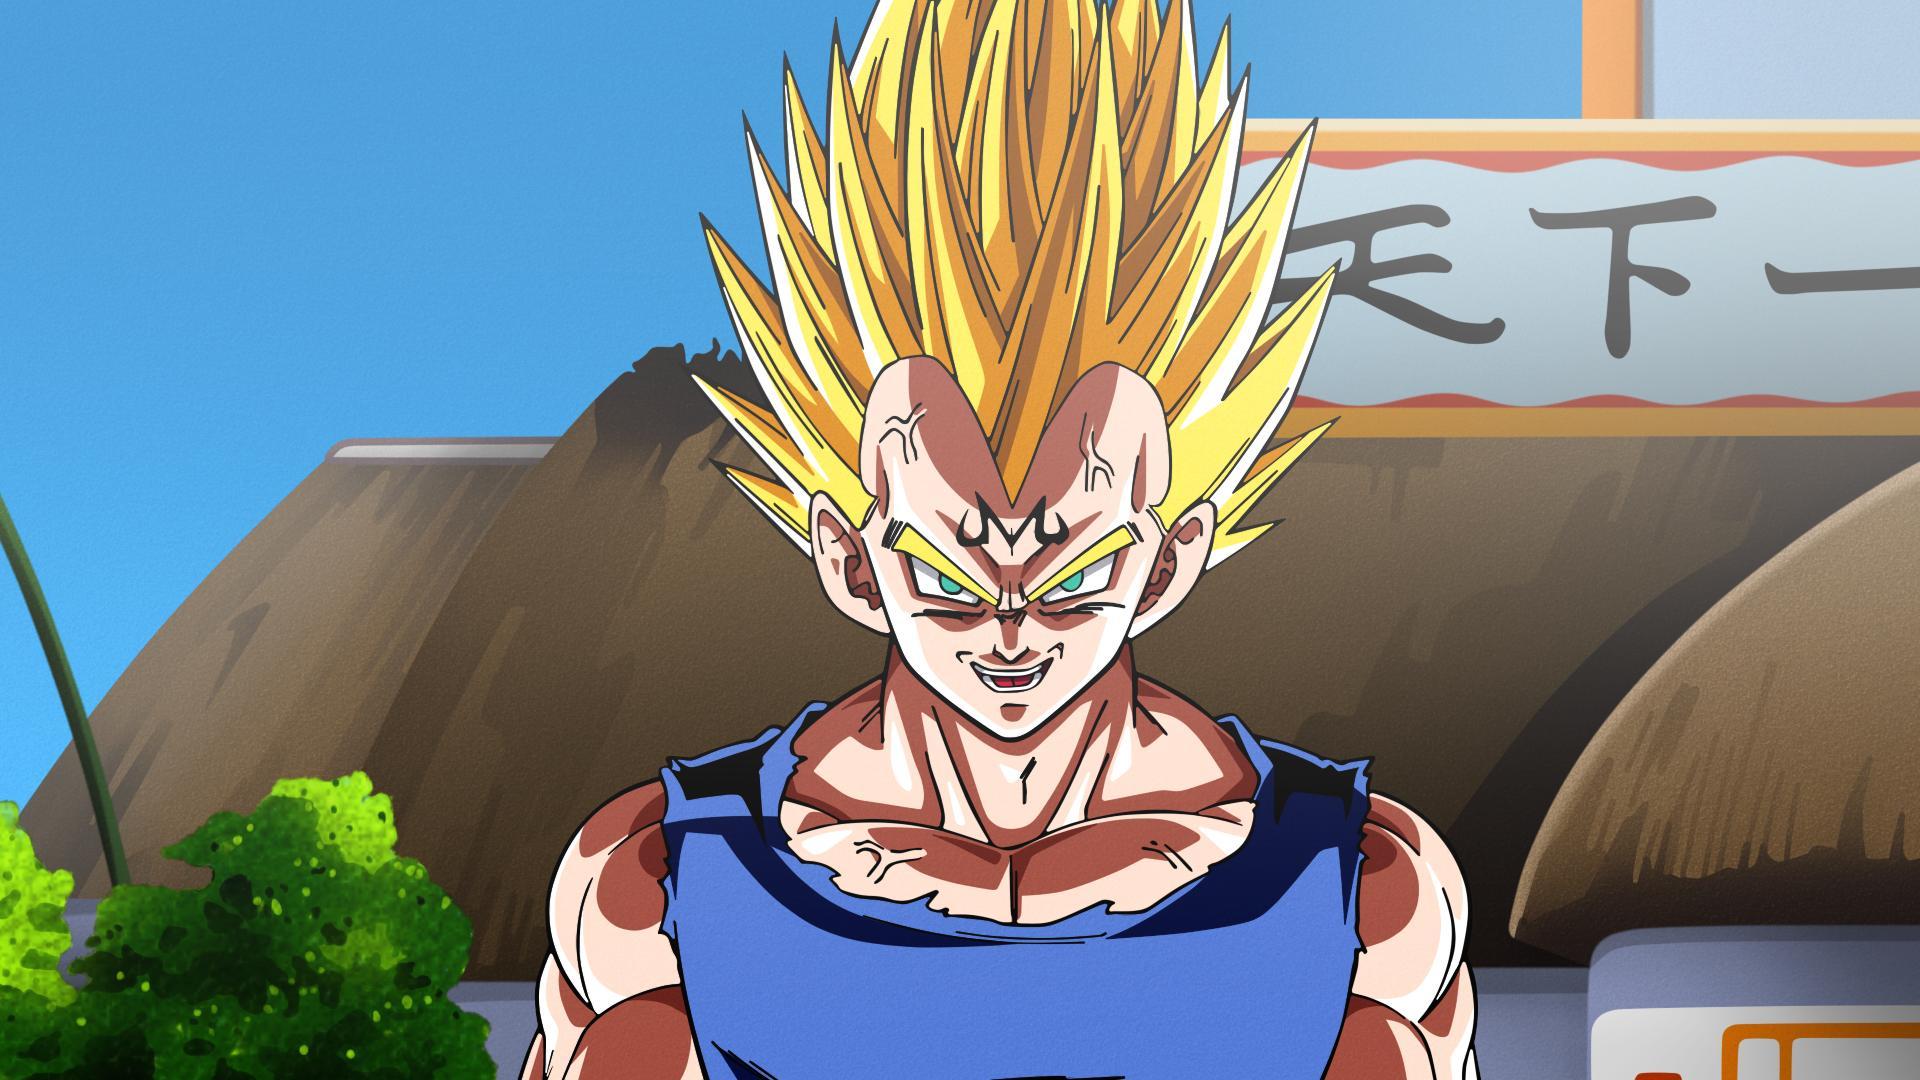 Dbz 3d Wallpapers Dragon Ball Vegeta Super Saiyan Wallpaper Anime